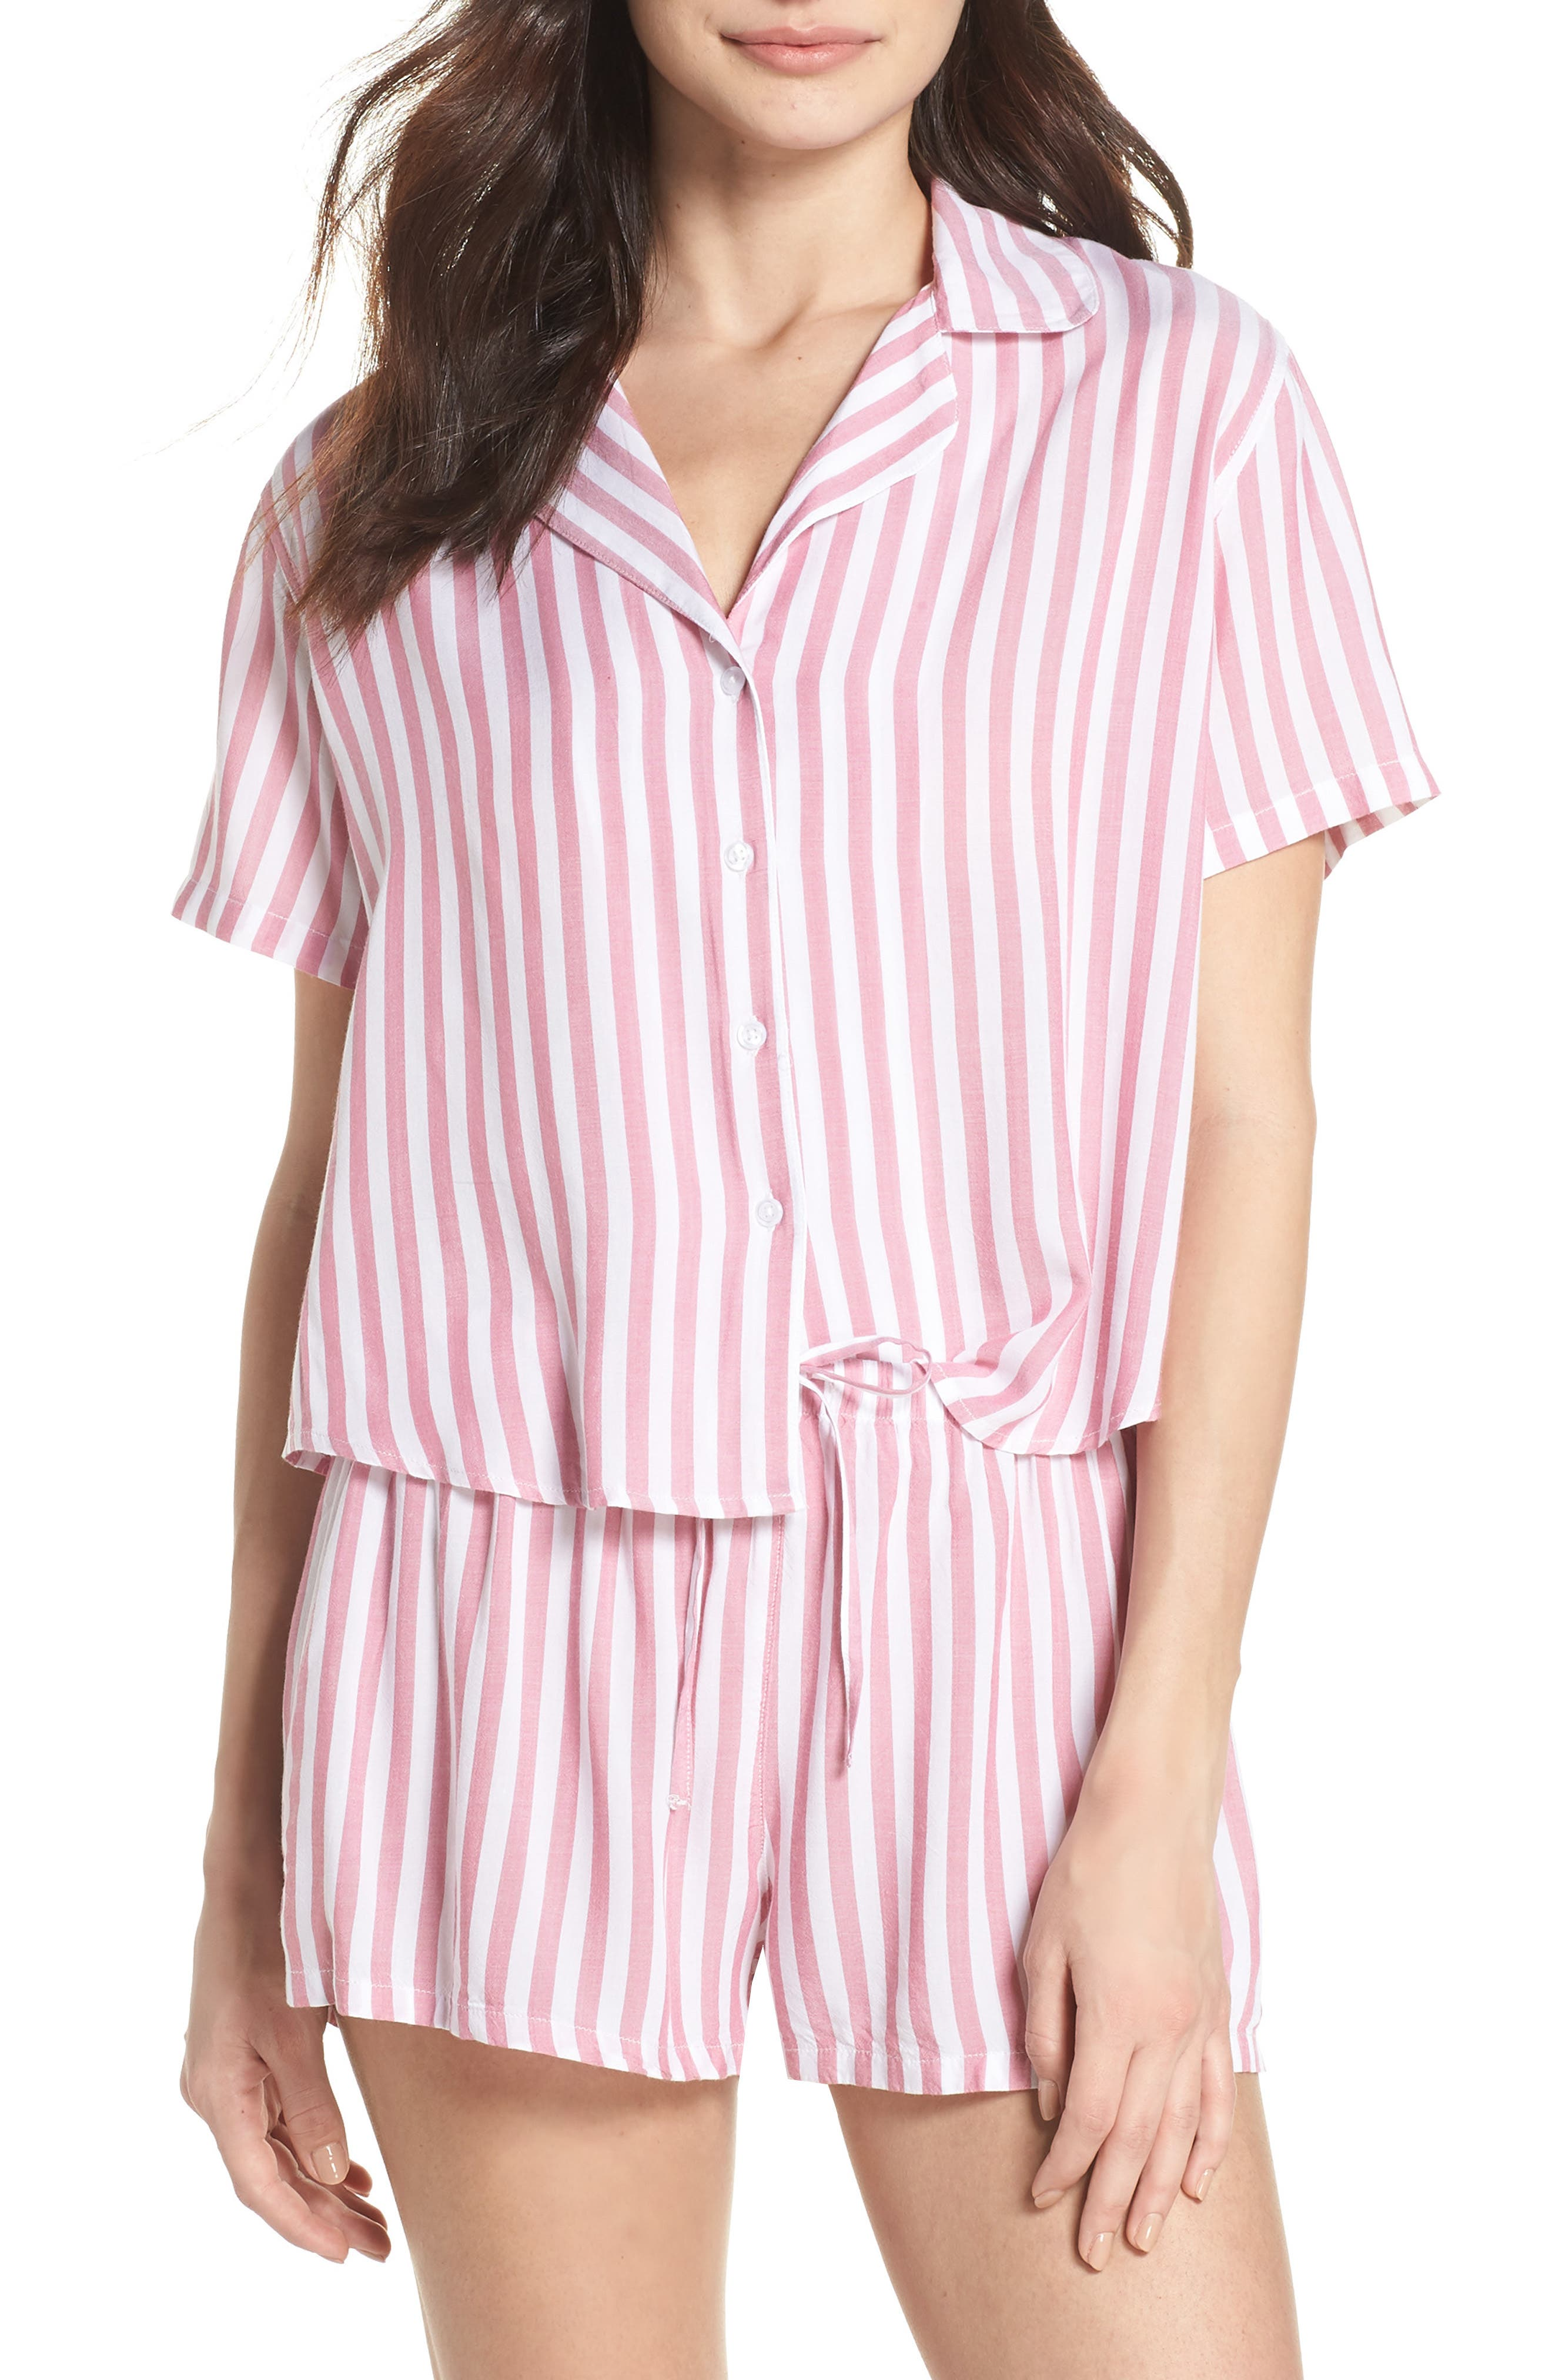 Stripe Short Pajamas,                             Main thumbnail 1, color,                             Garnet White